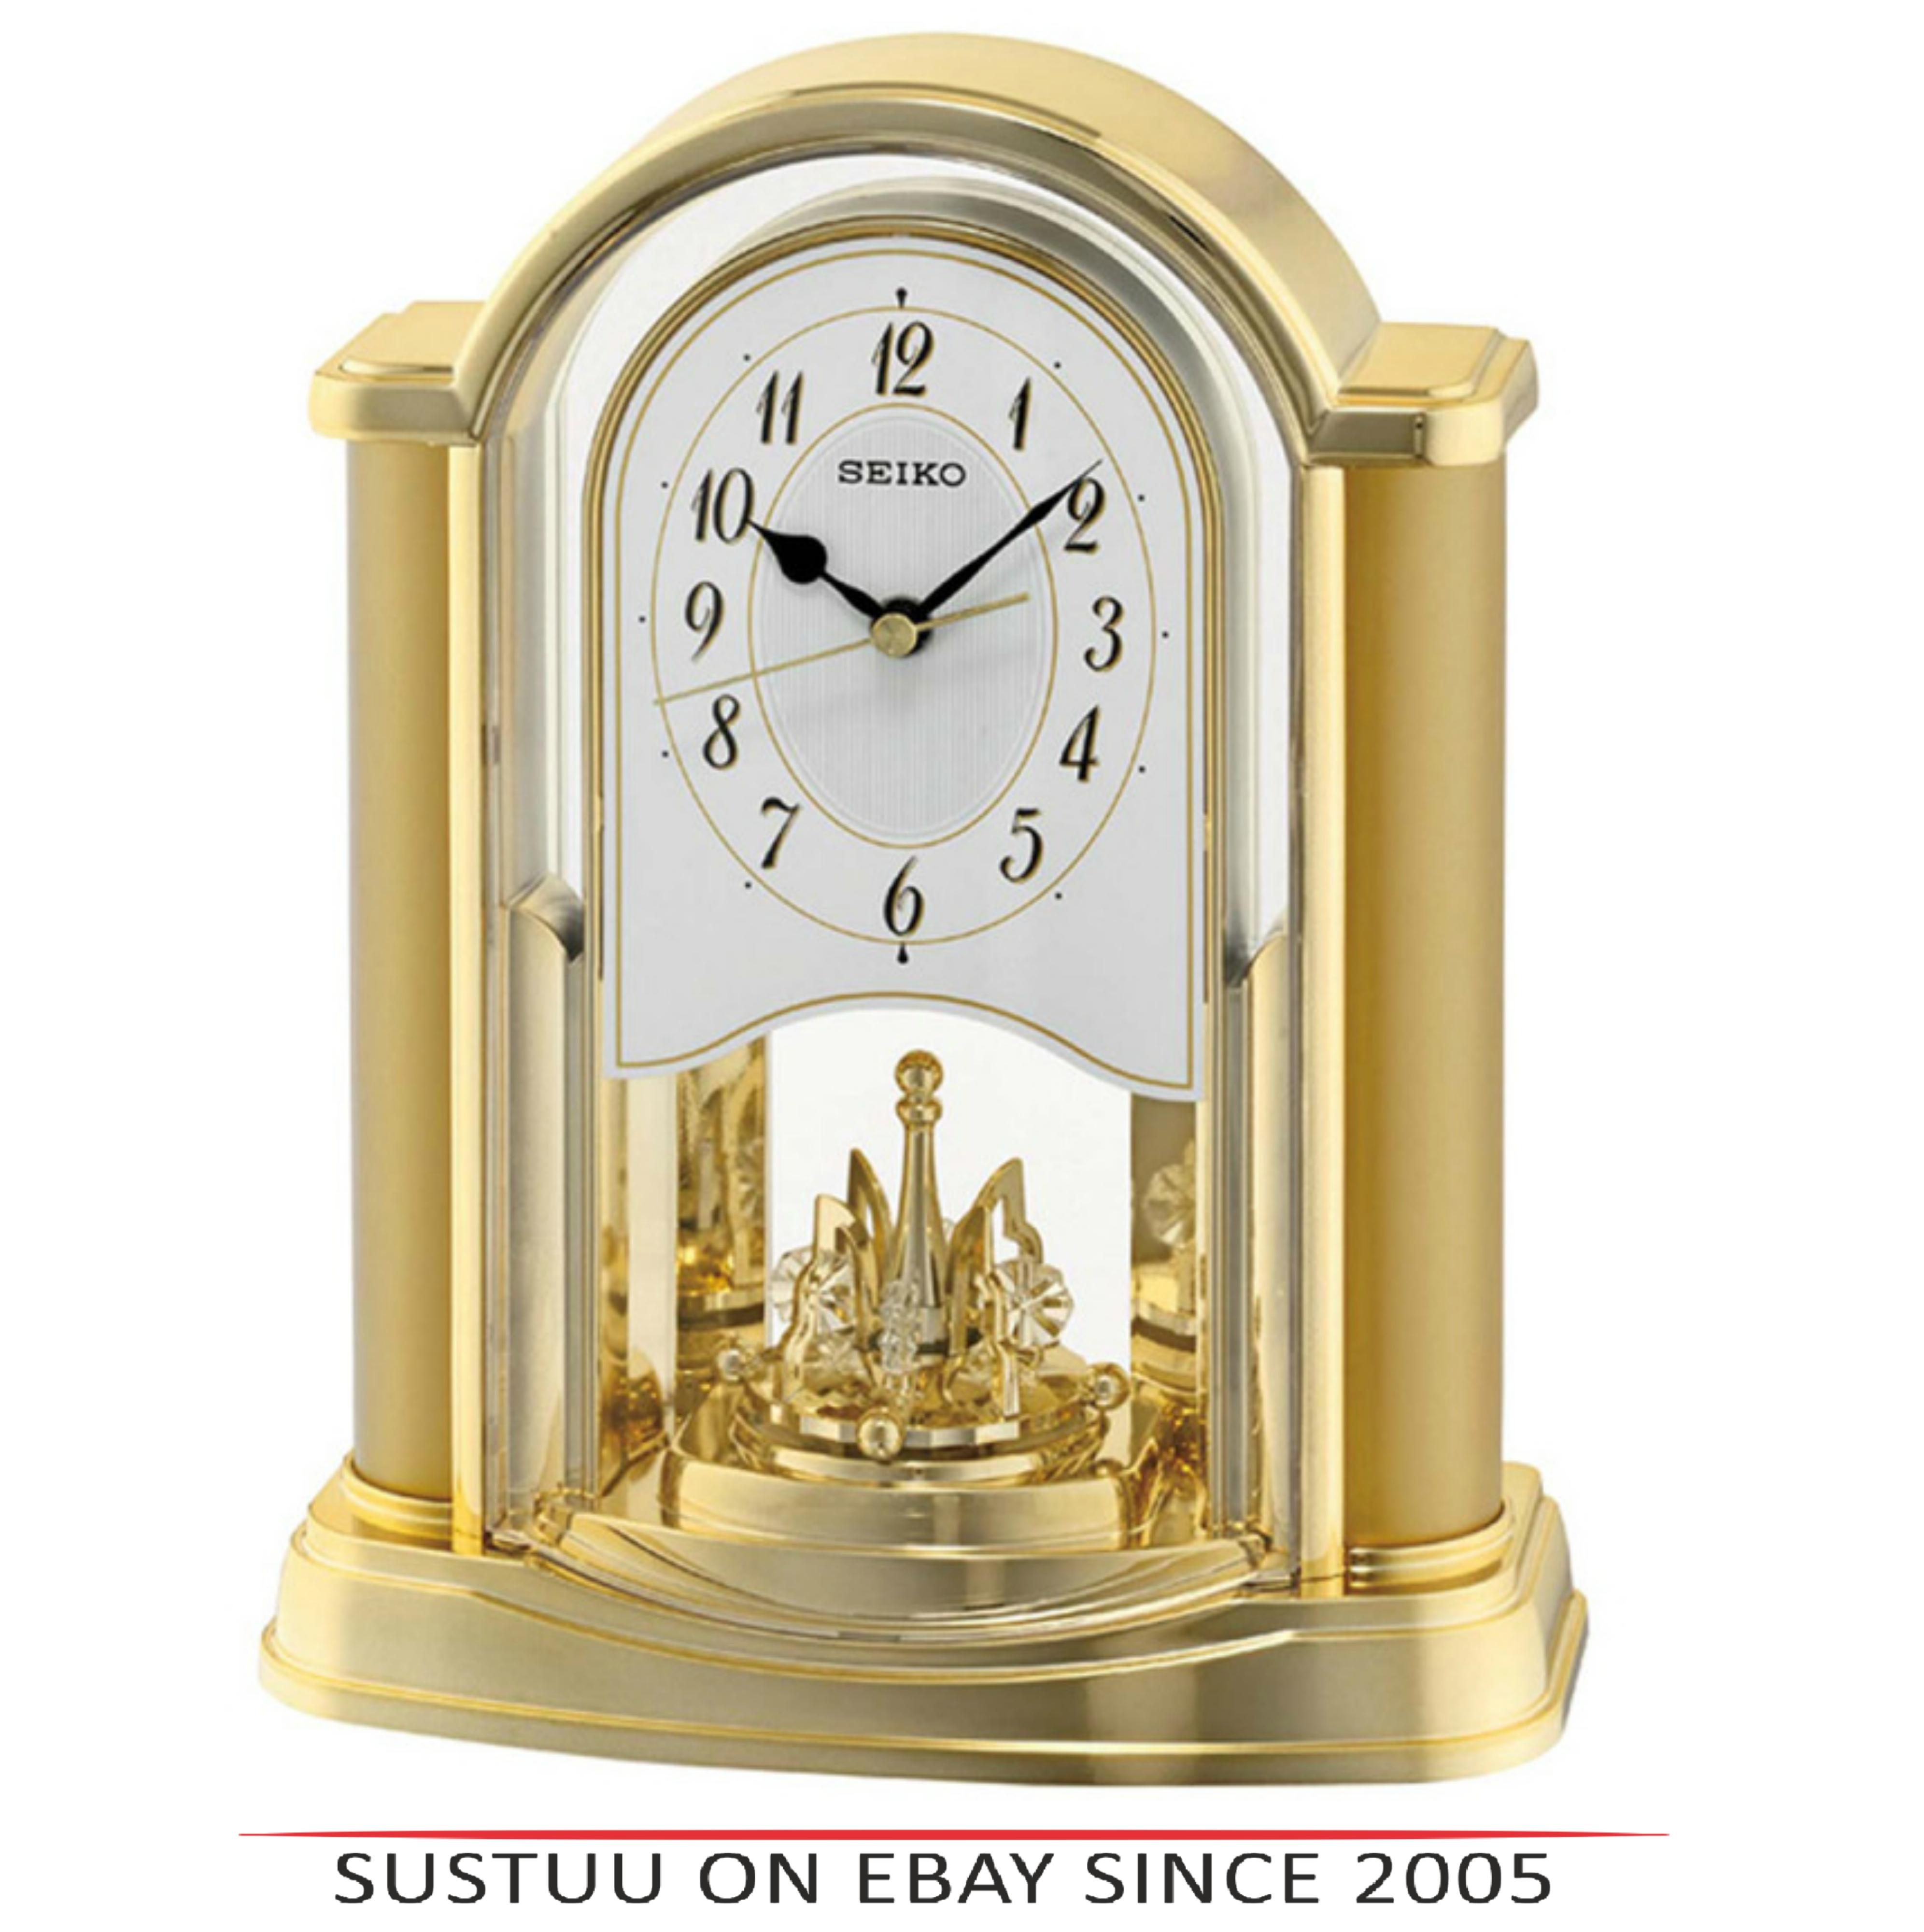 Seiko QXN228G New Rotating Pendulum Analogue Clock With Battery Operated - Gold